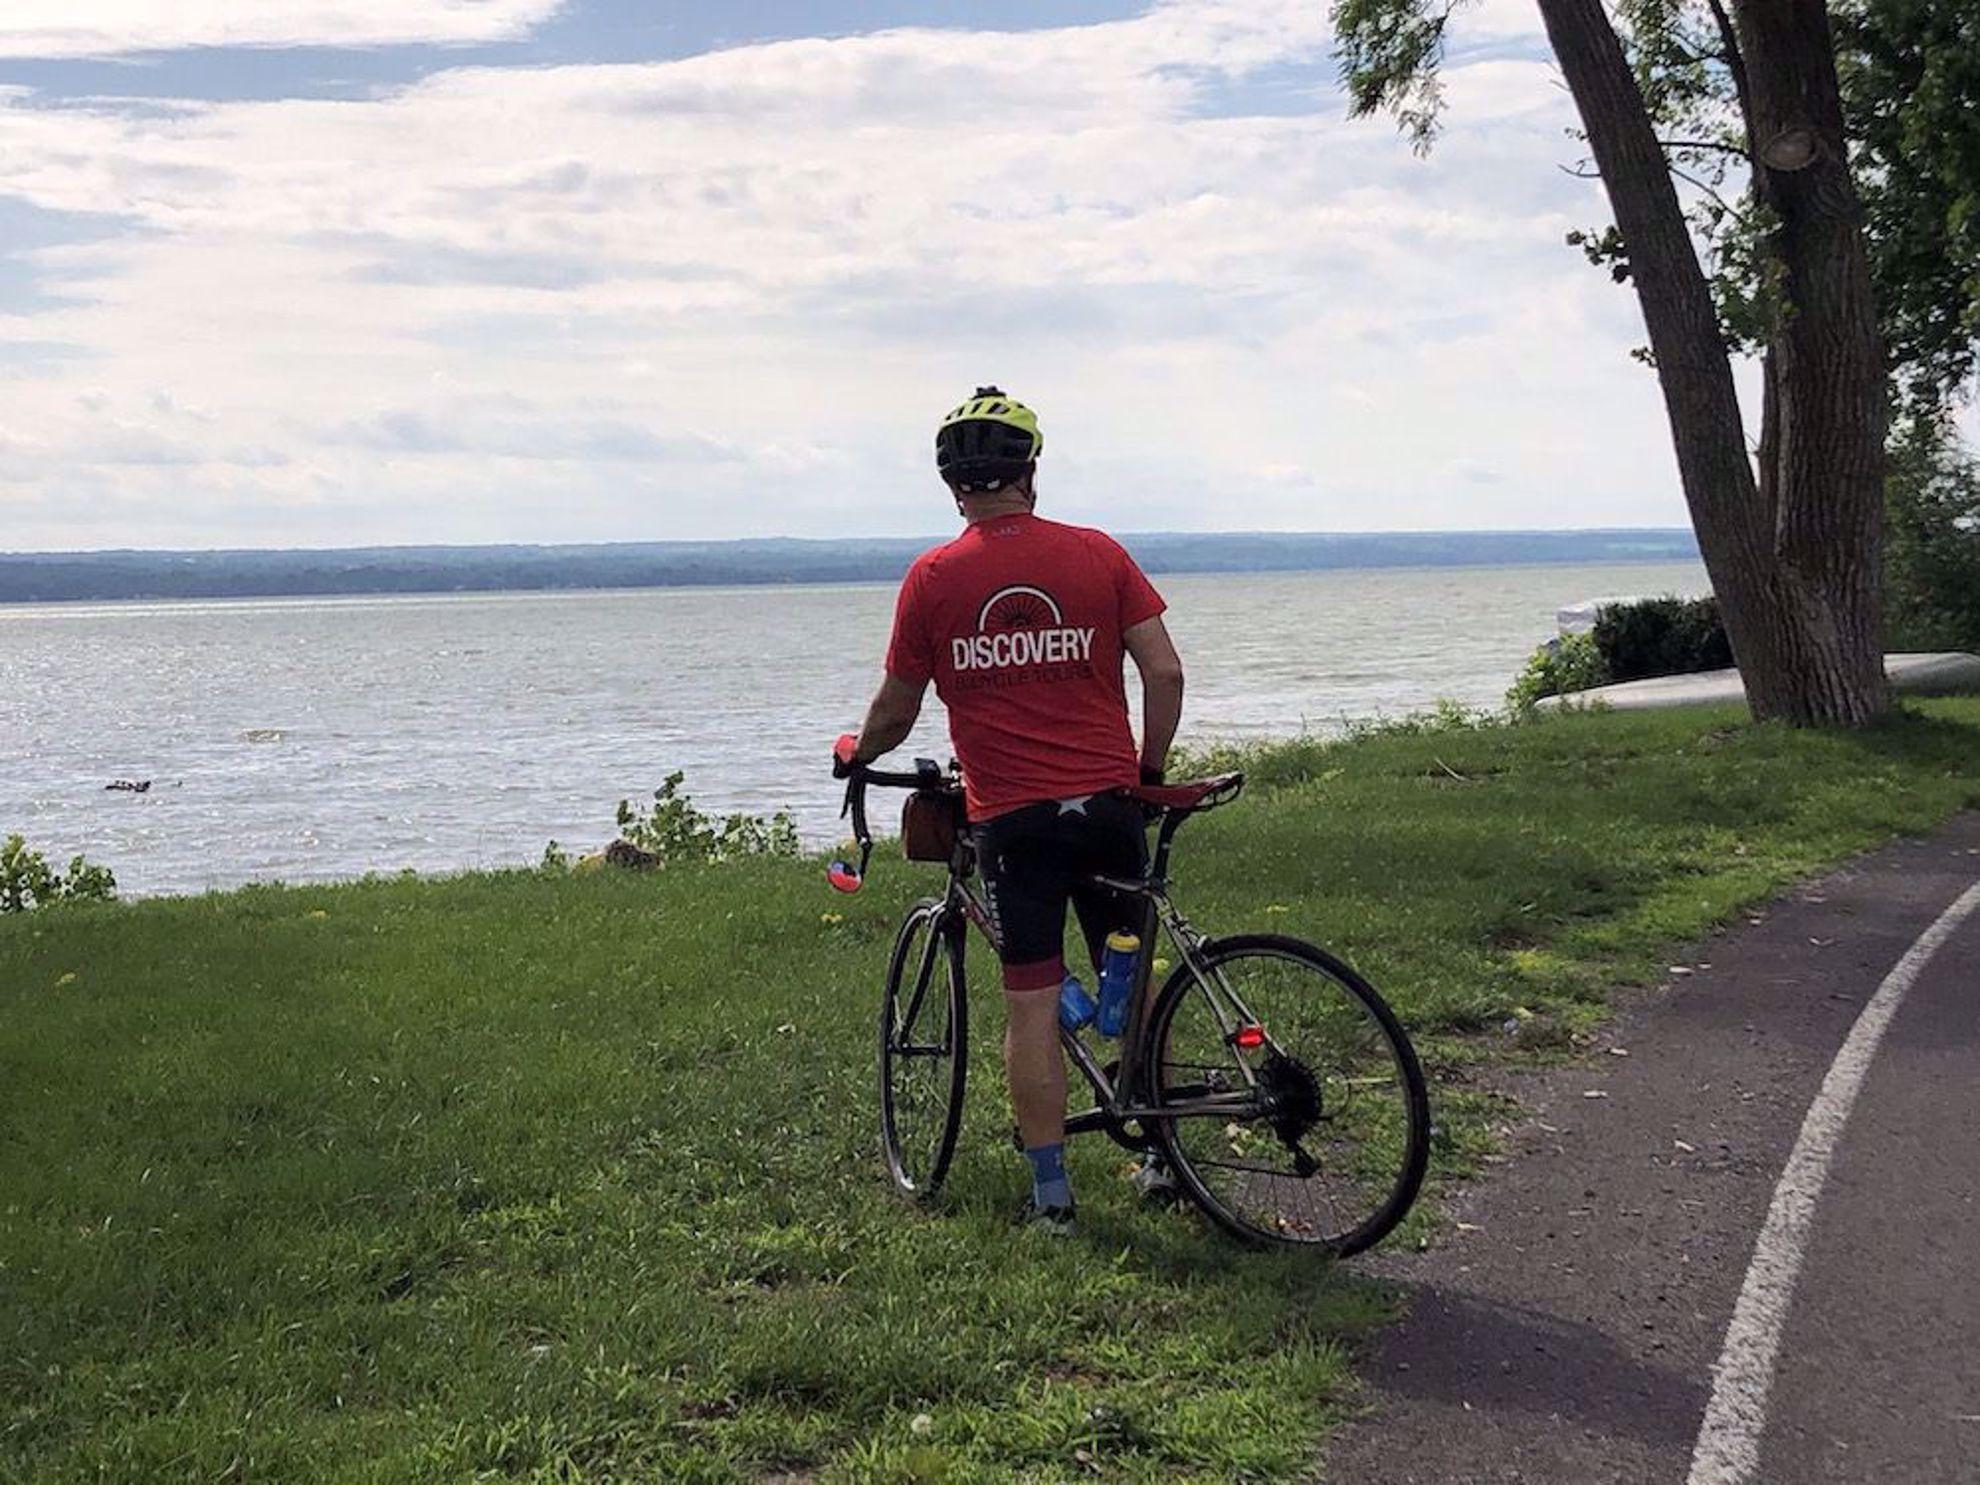 Scott by the lake